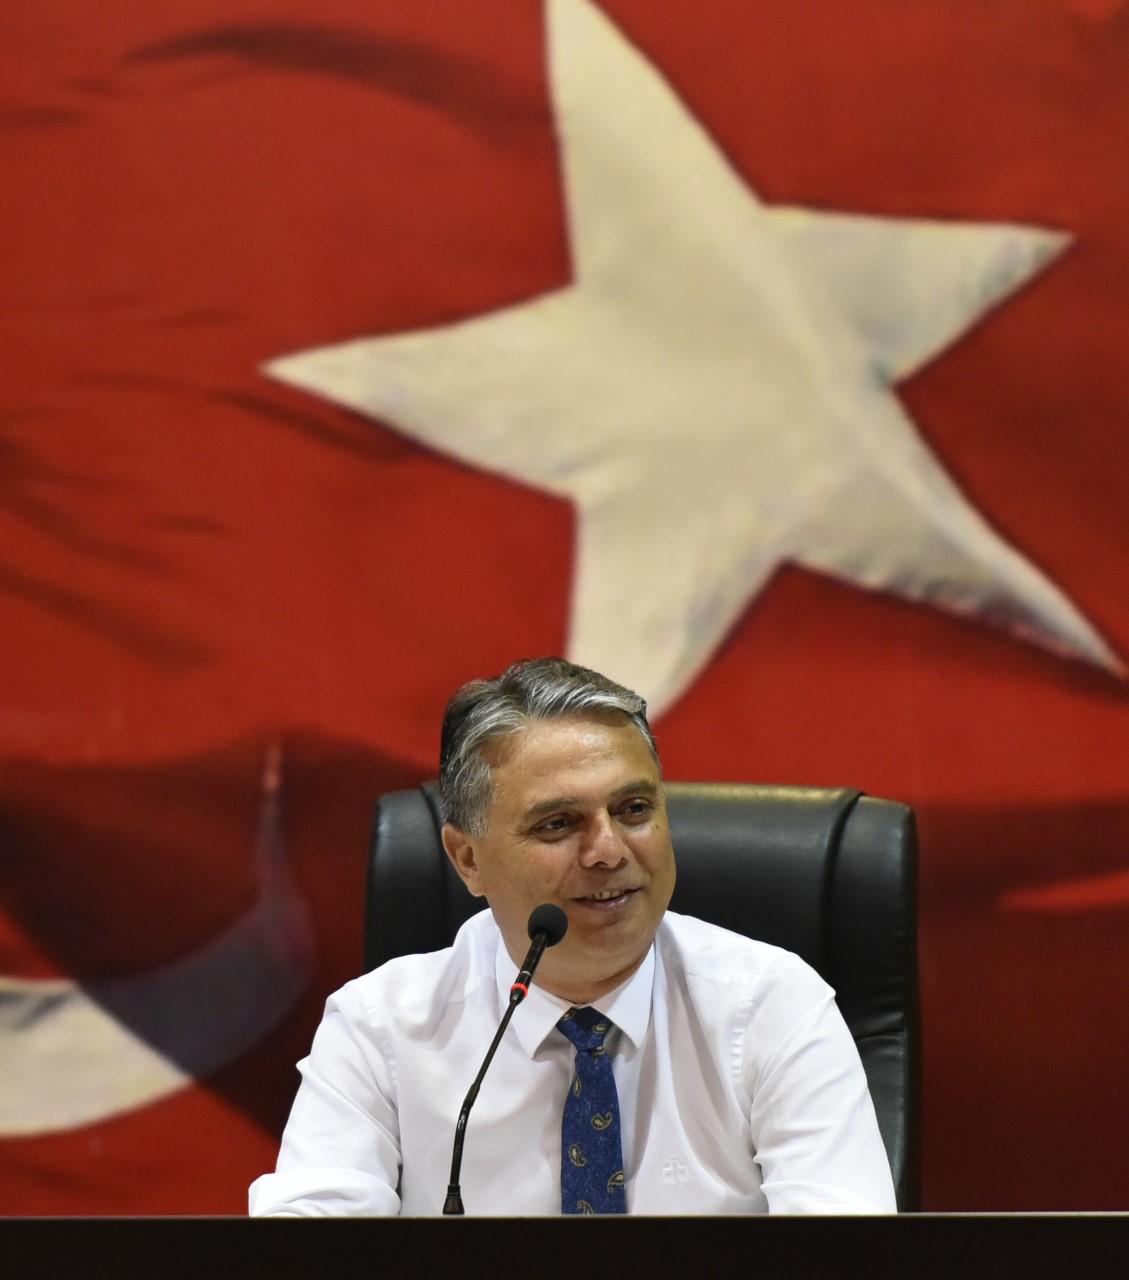 ANTALYA MURATPAŞA MUHTAR MECLİSİ TOPLANDI...